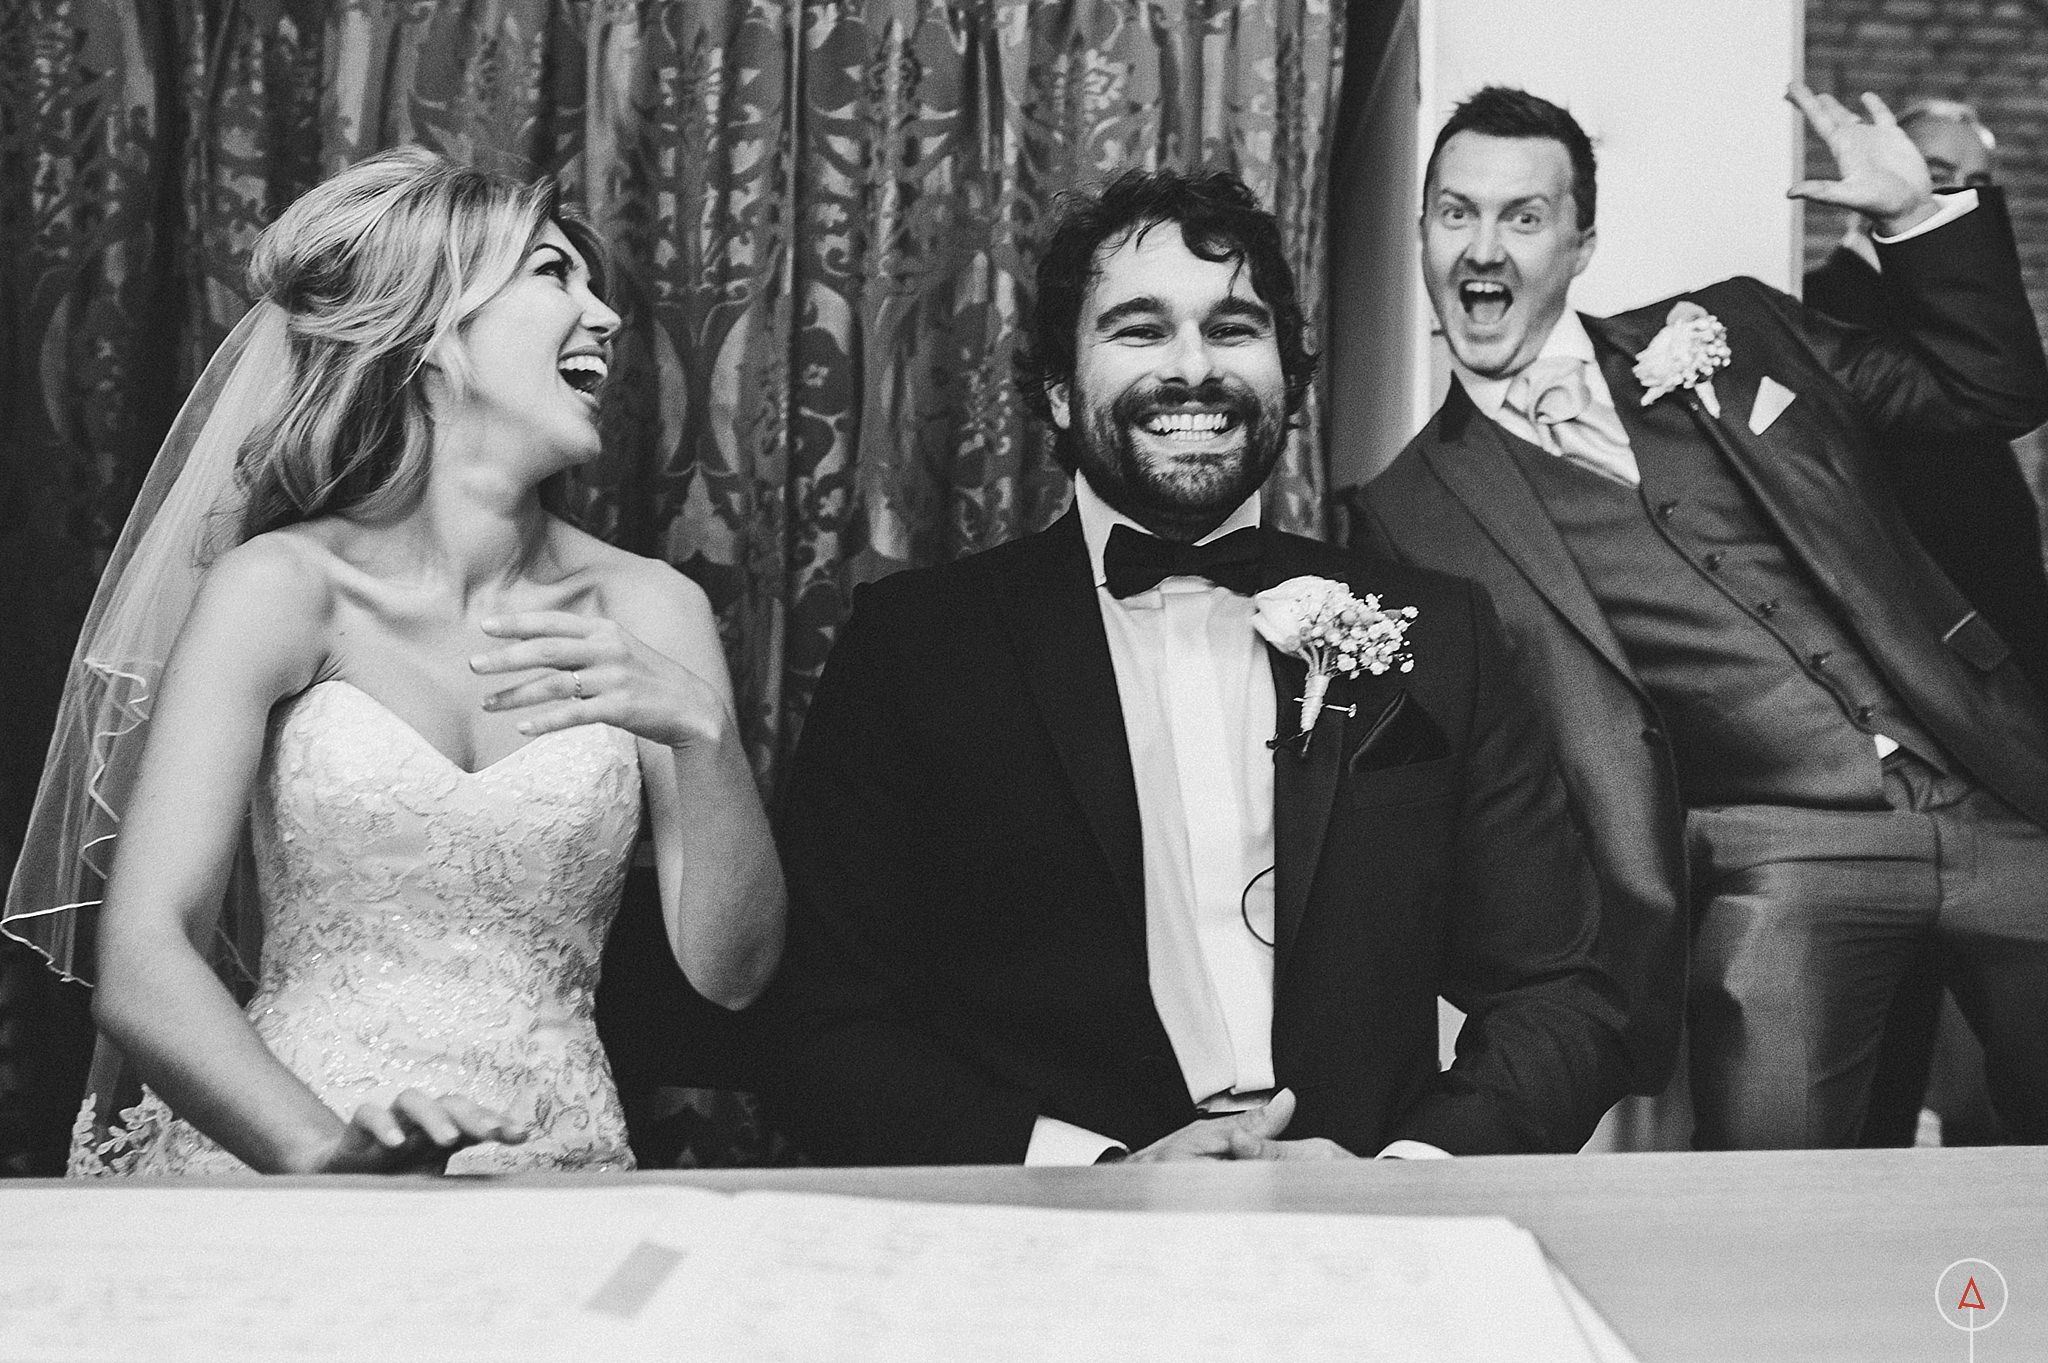 cardiff-wedding-photographer-aga-tomaszek_0365